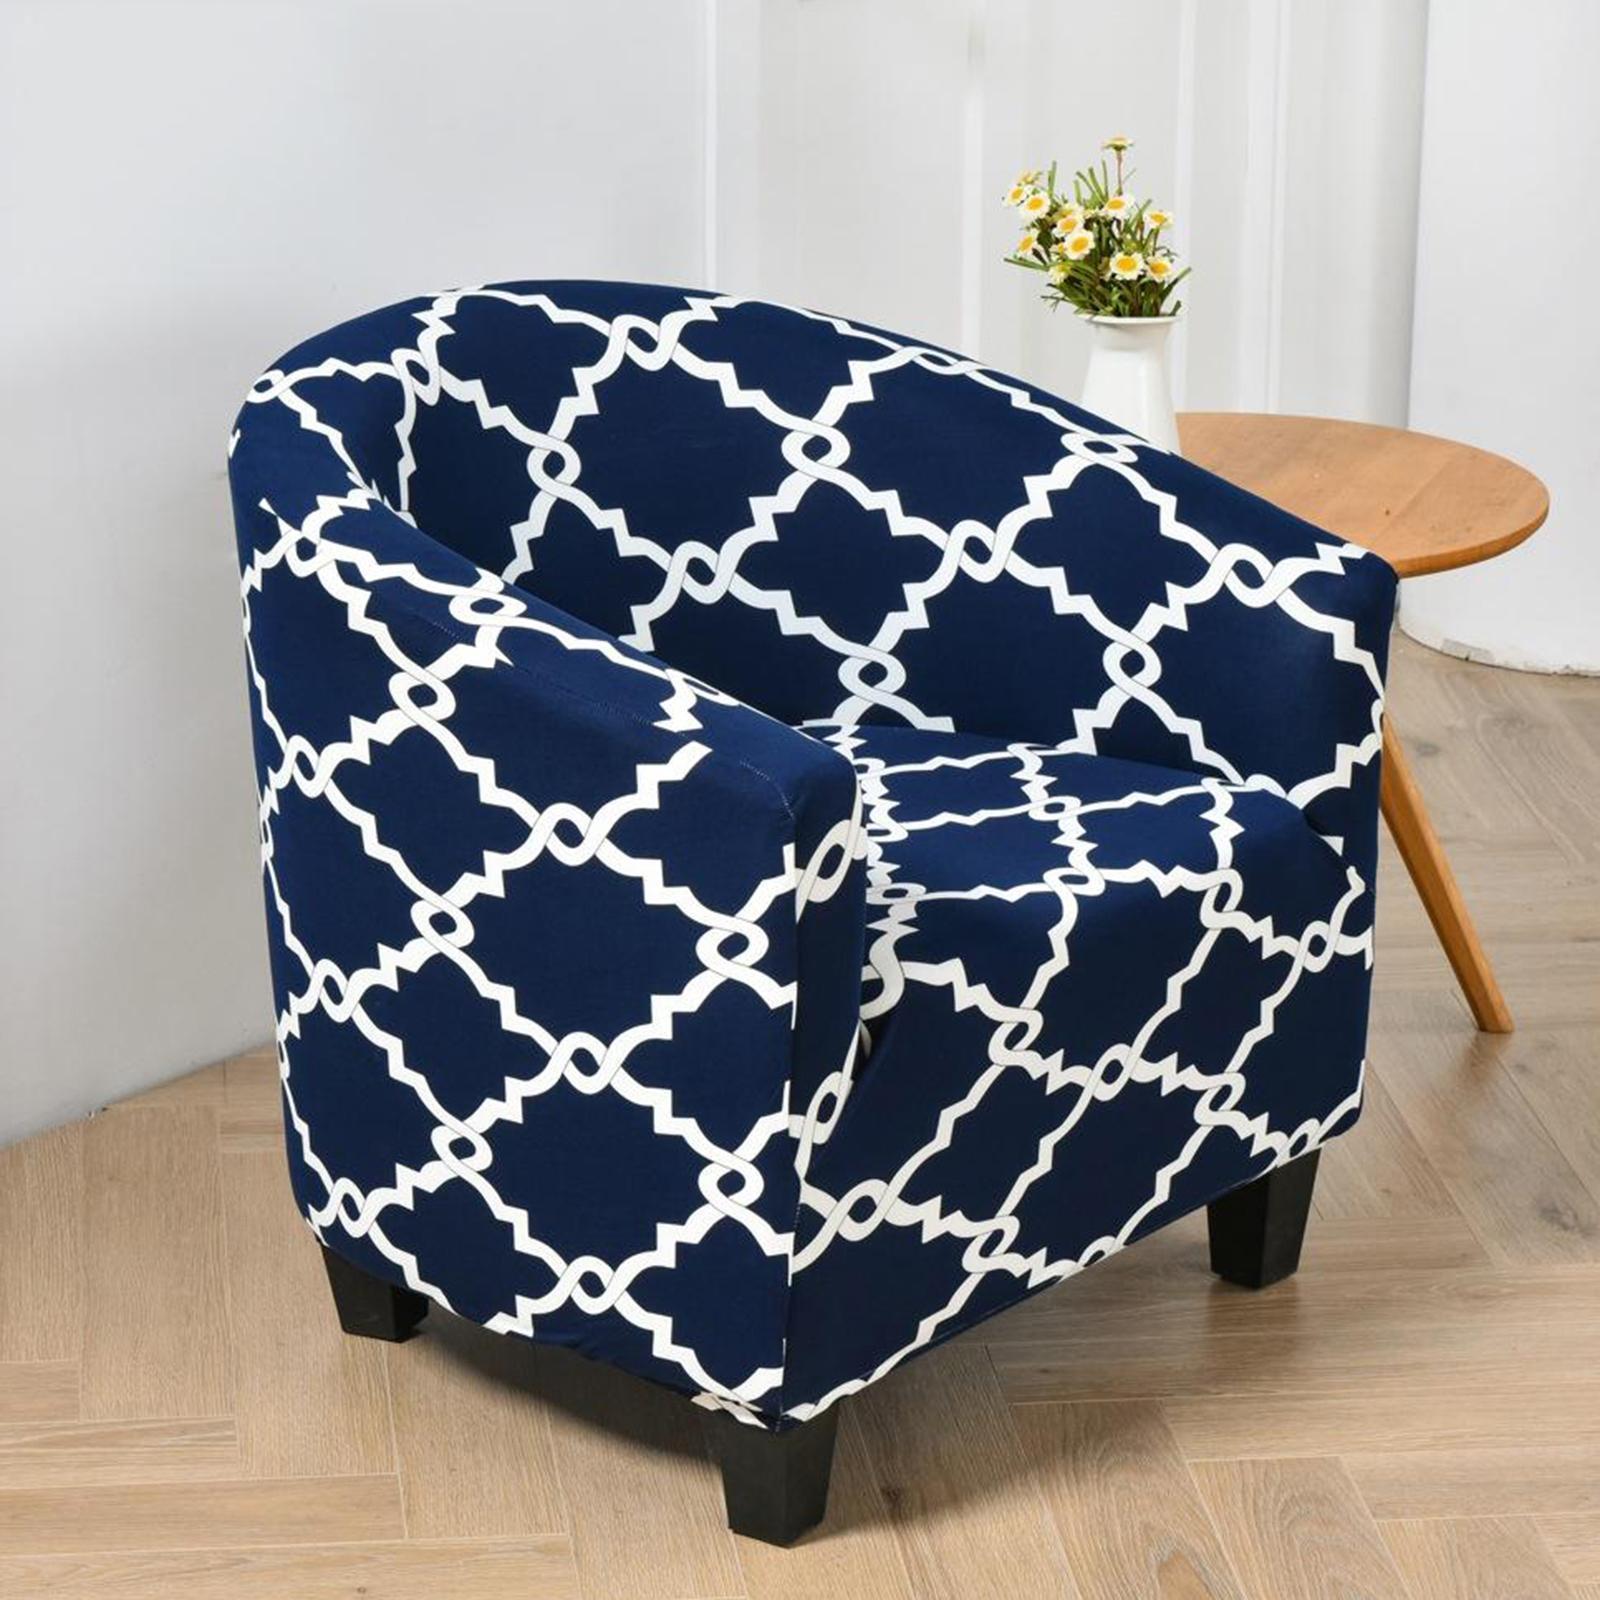 miniatura 9 - Fodera per poltrona singola per poltrona Fodera per sedia in colori assortiti